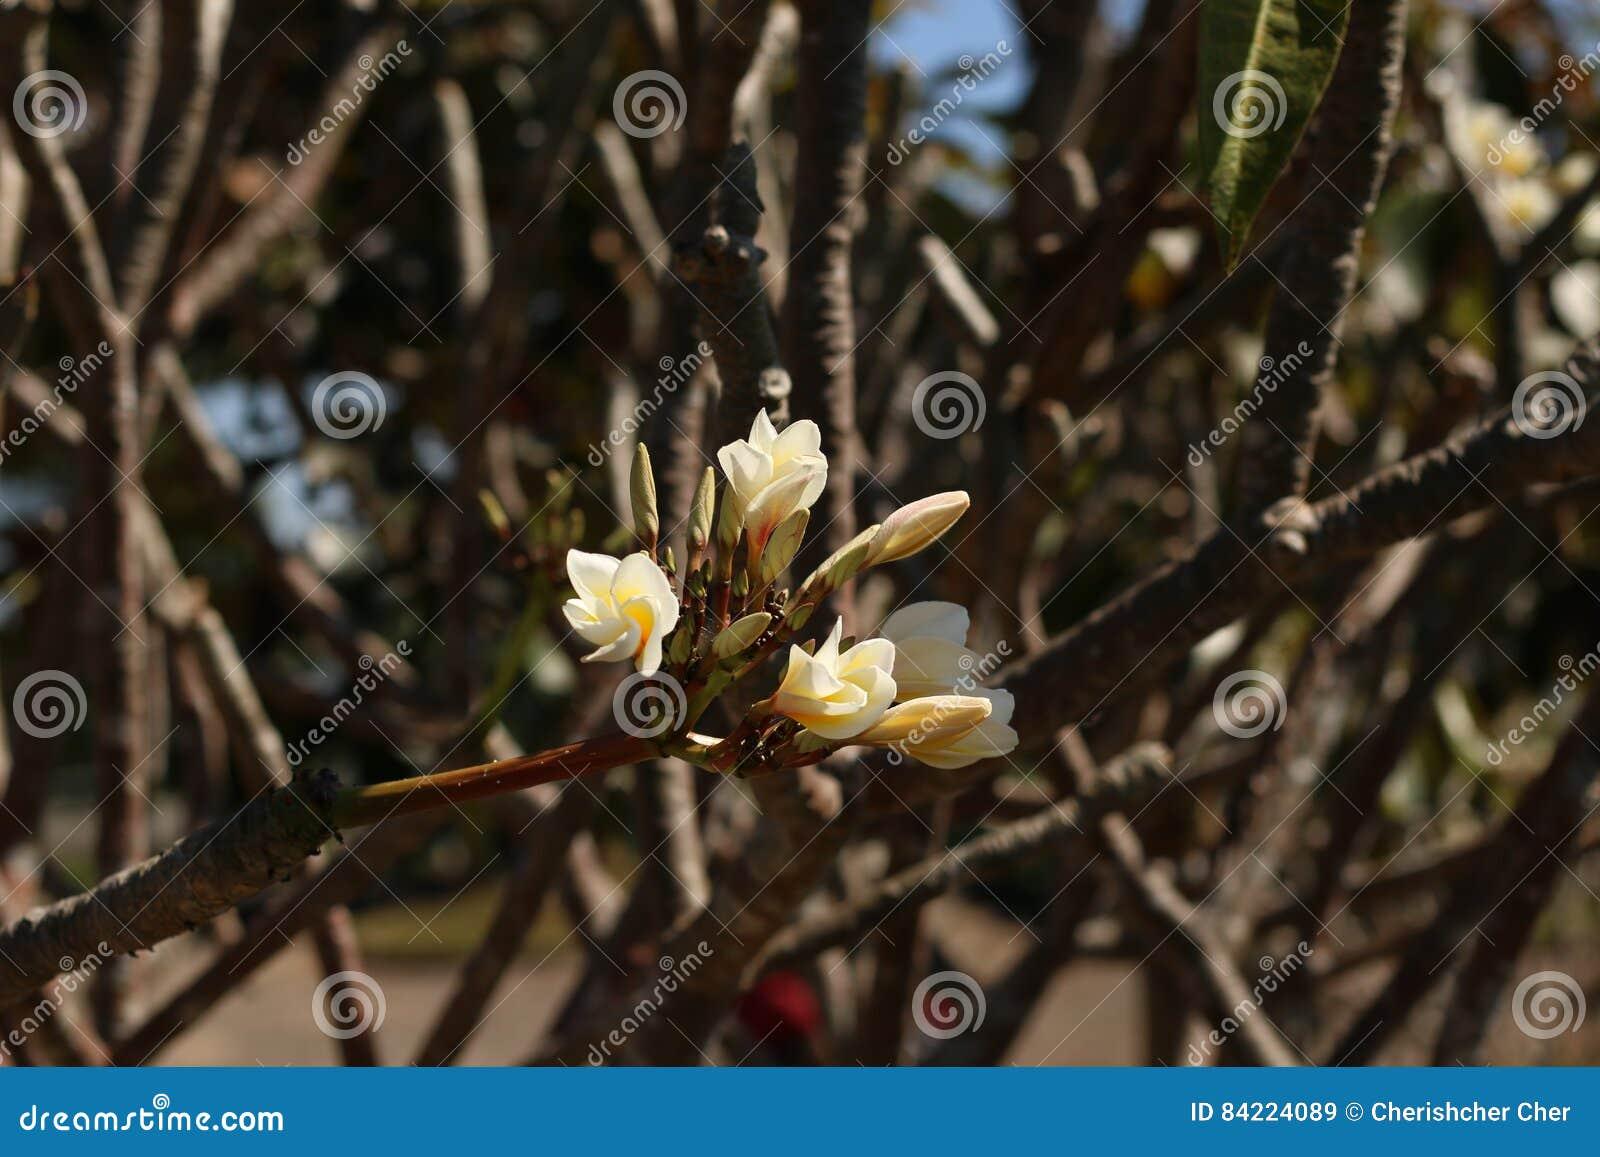 Plumeria en Tailandia